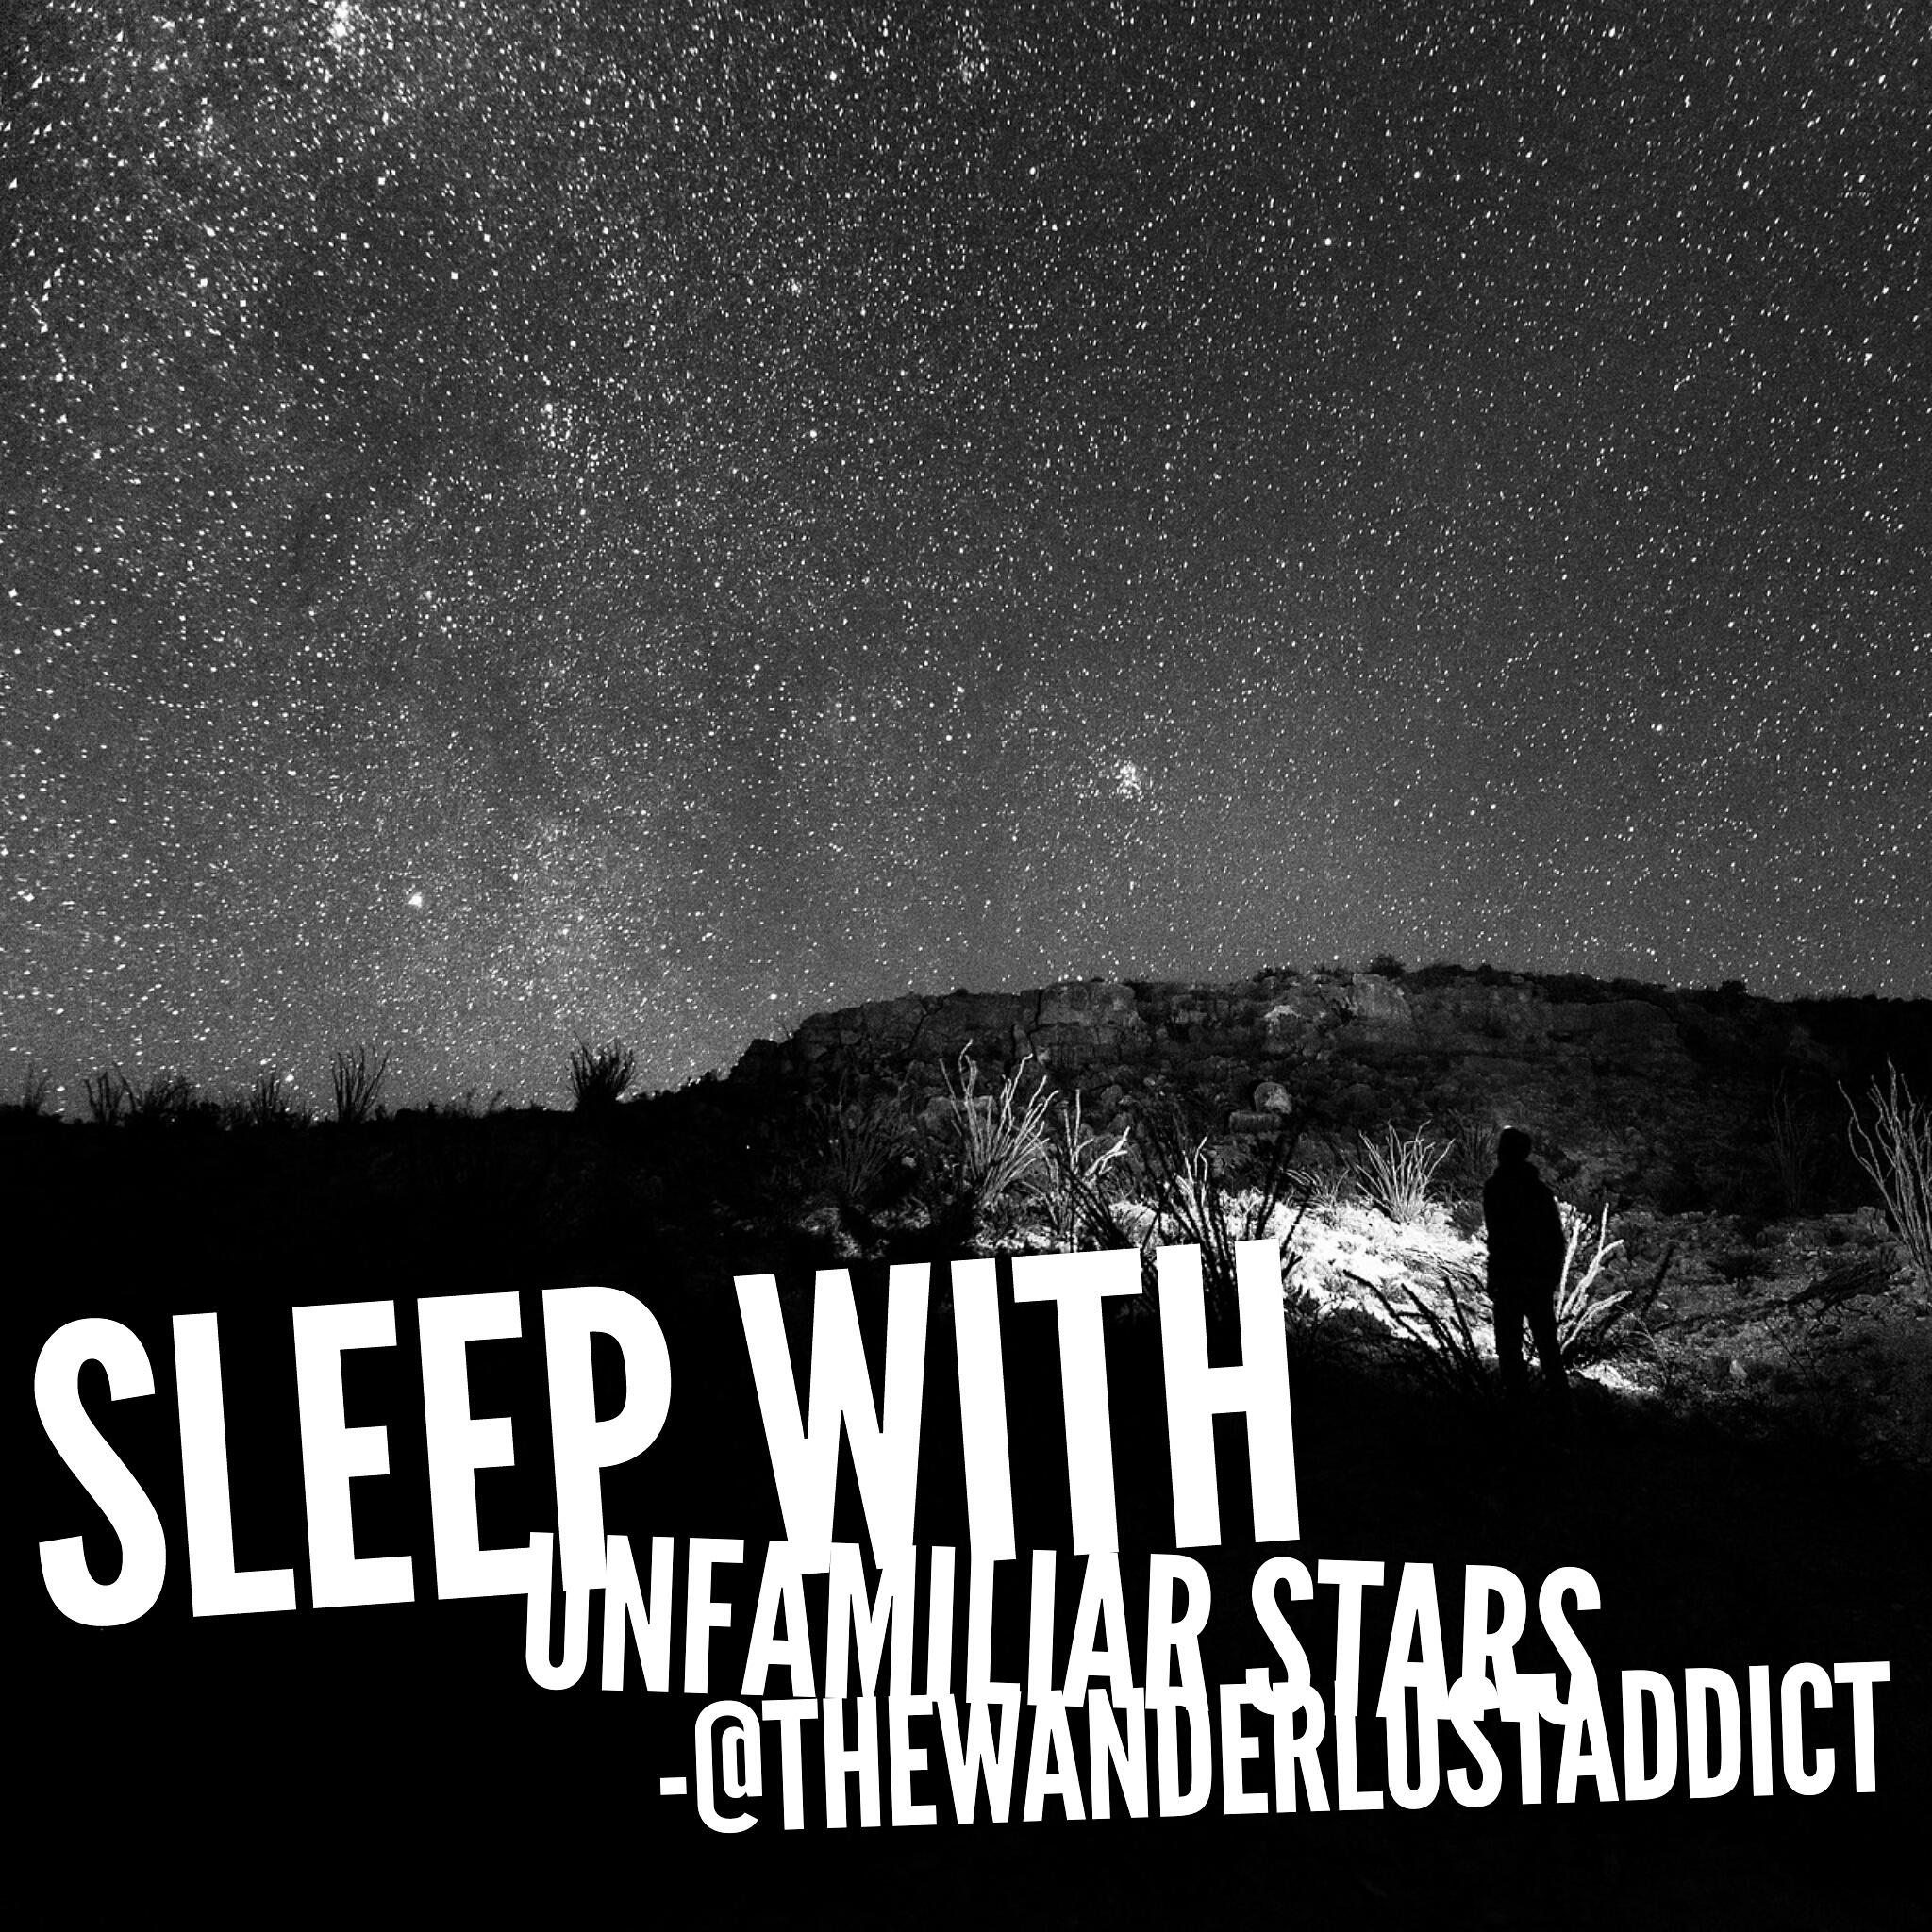 Sleep with unfamiliar stars